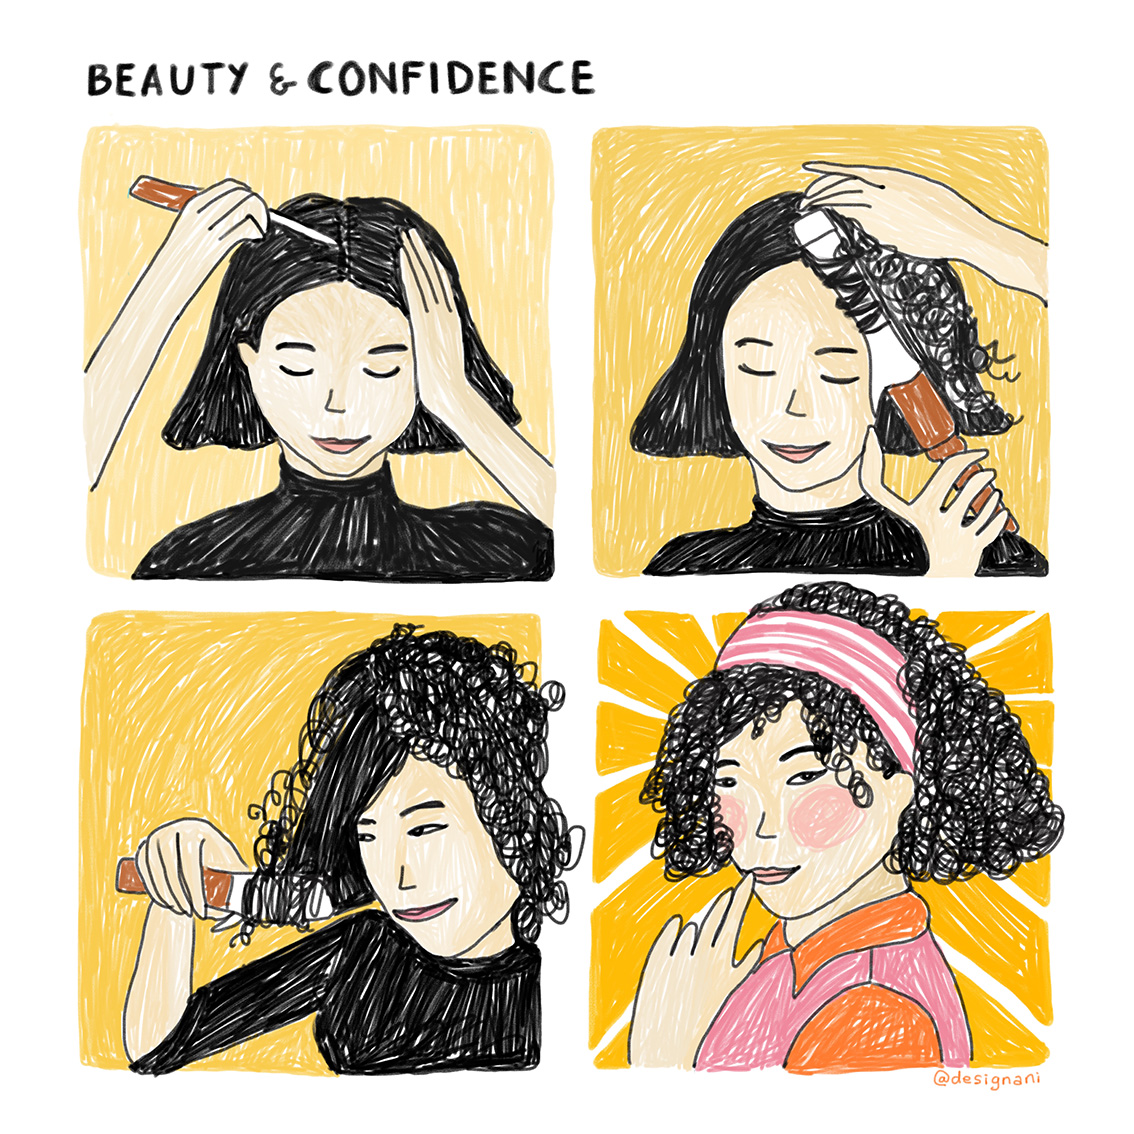 Designani_confidence.jpg